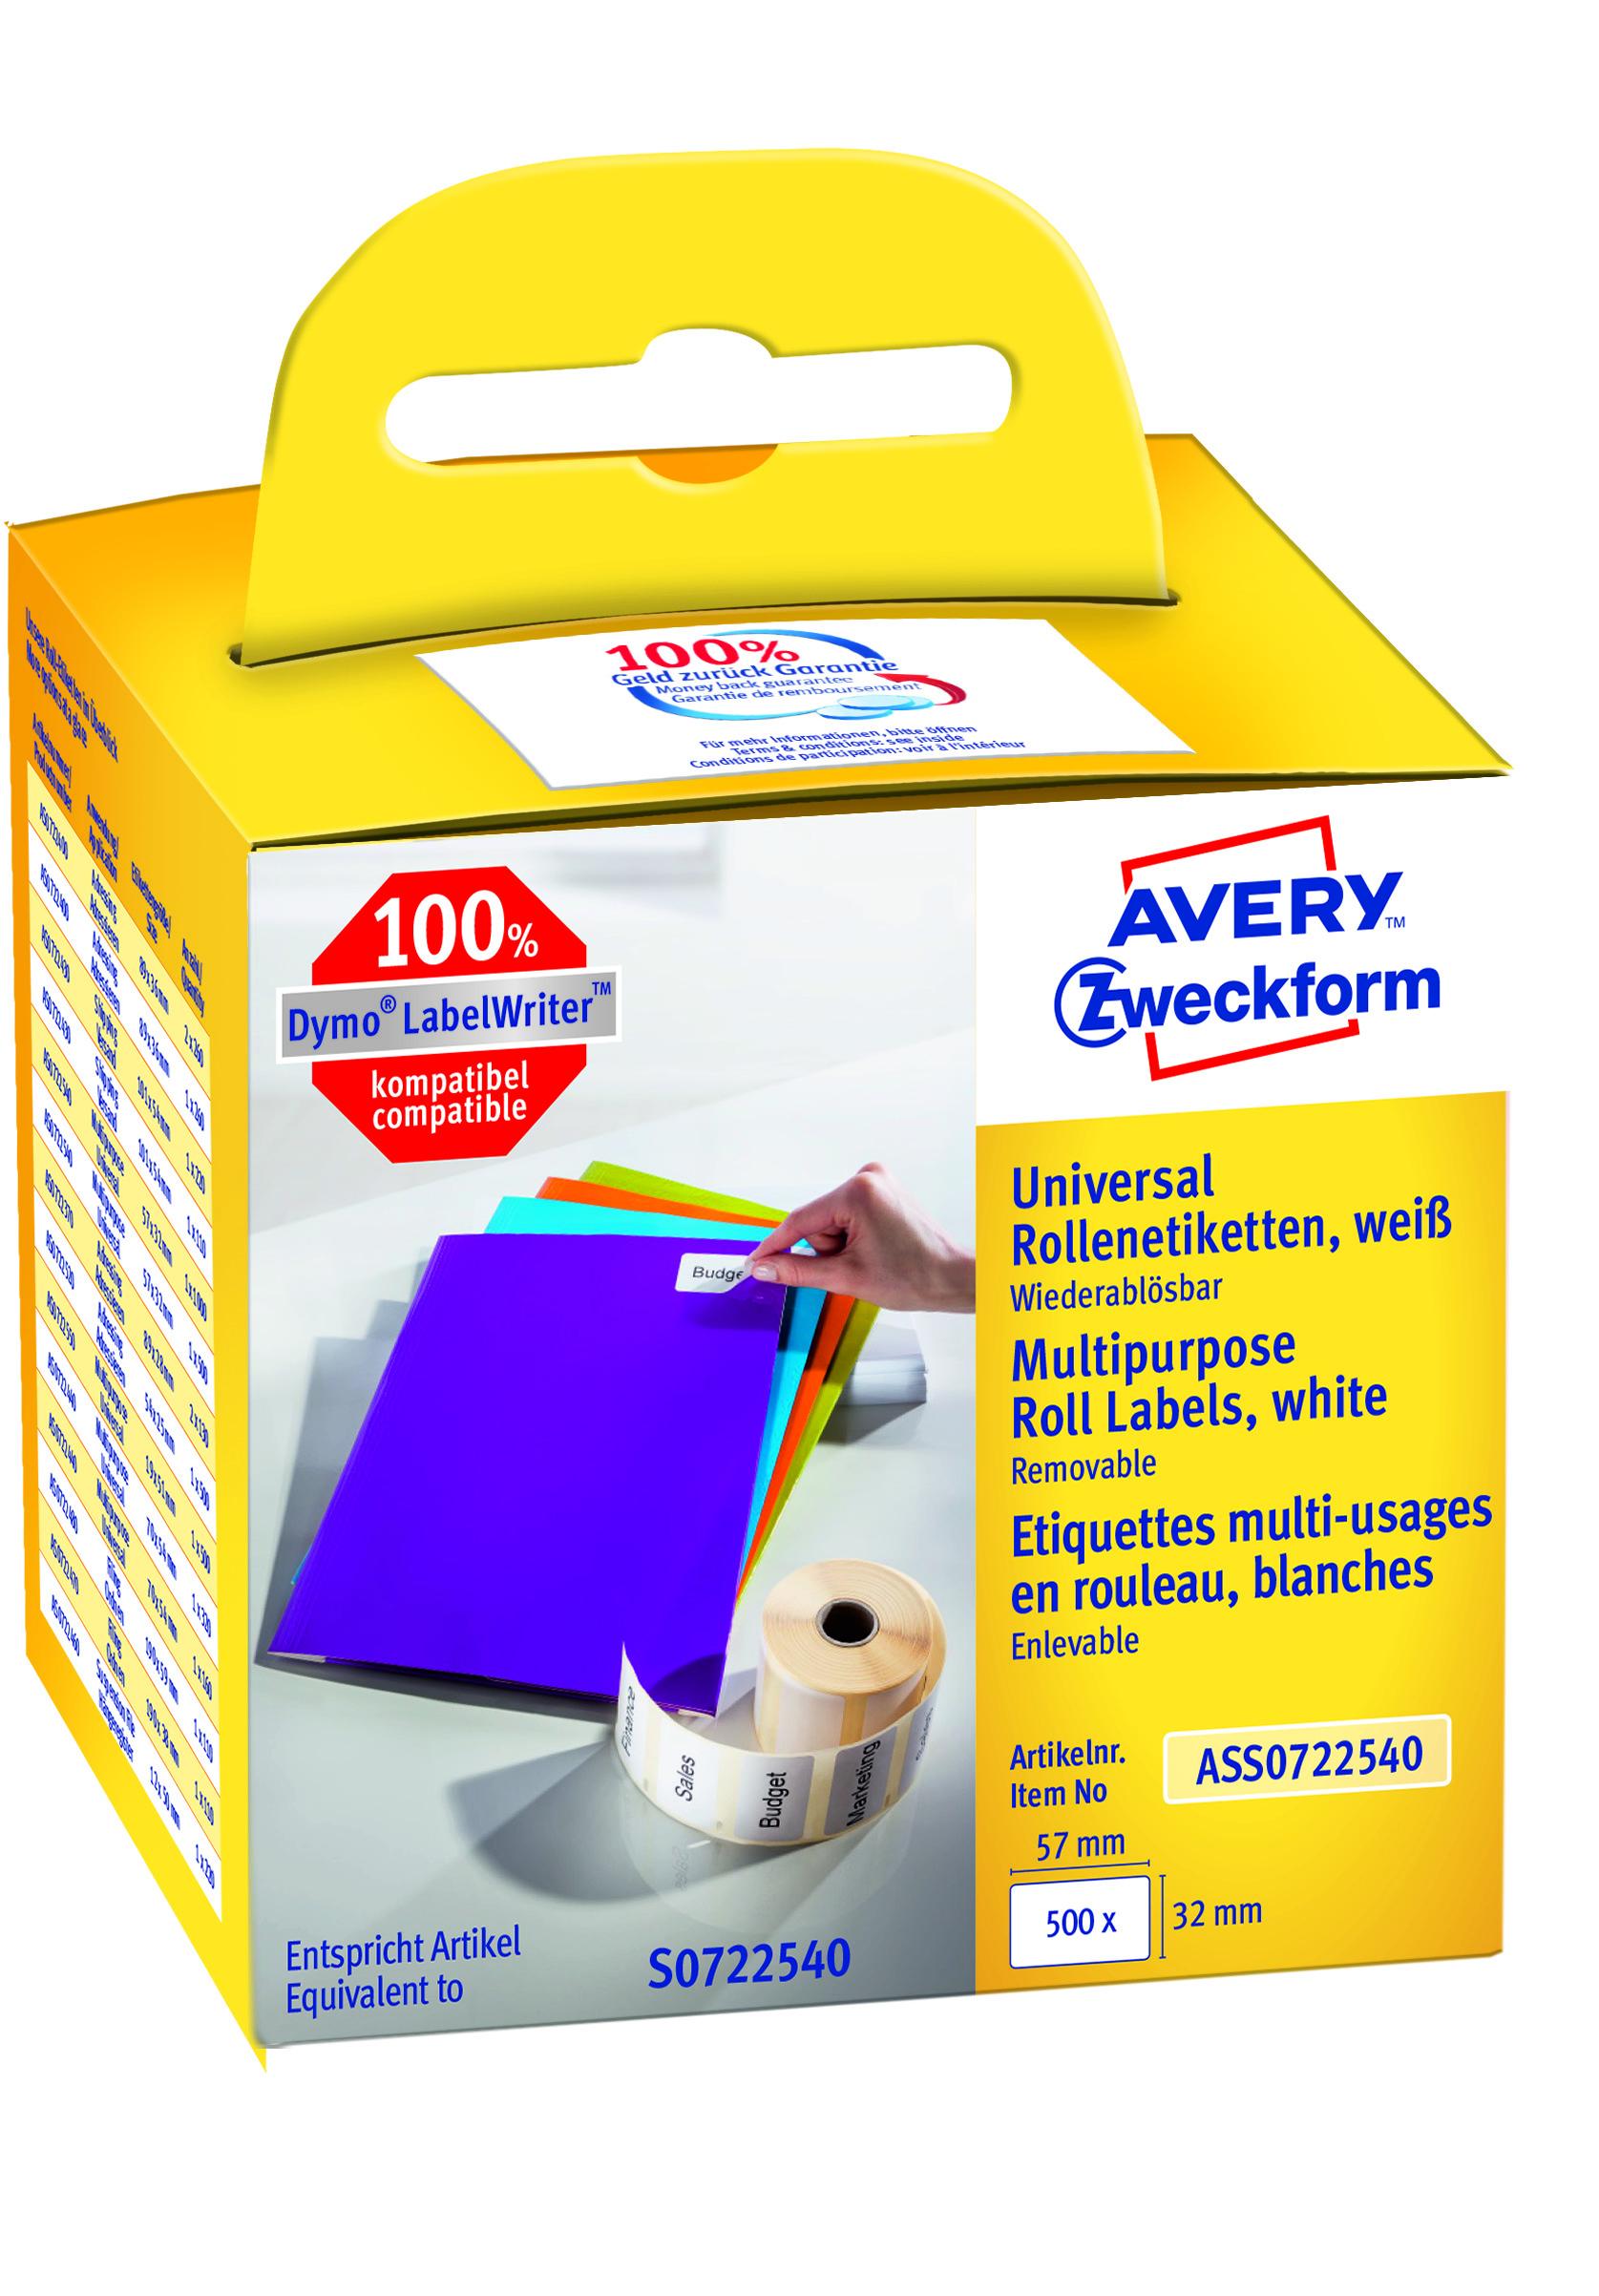 Image of Avery aftagelig etiket på rulle 57x32mm (500)